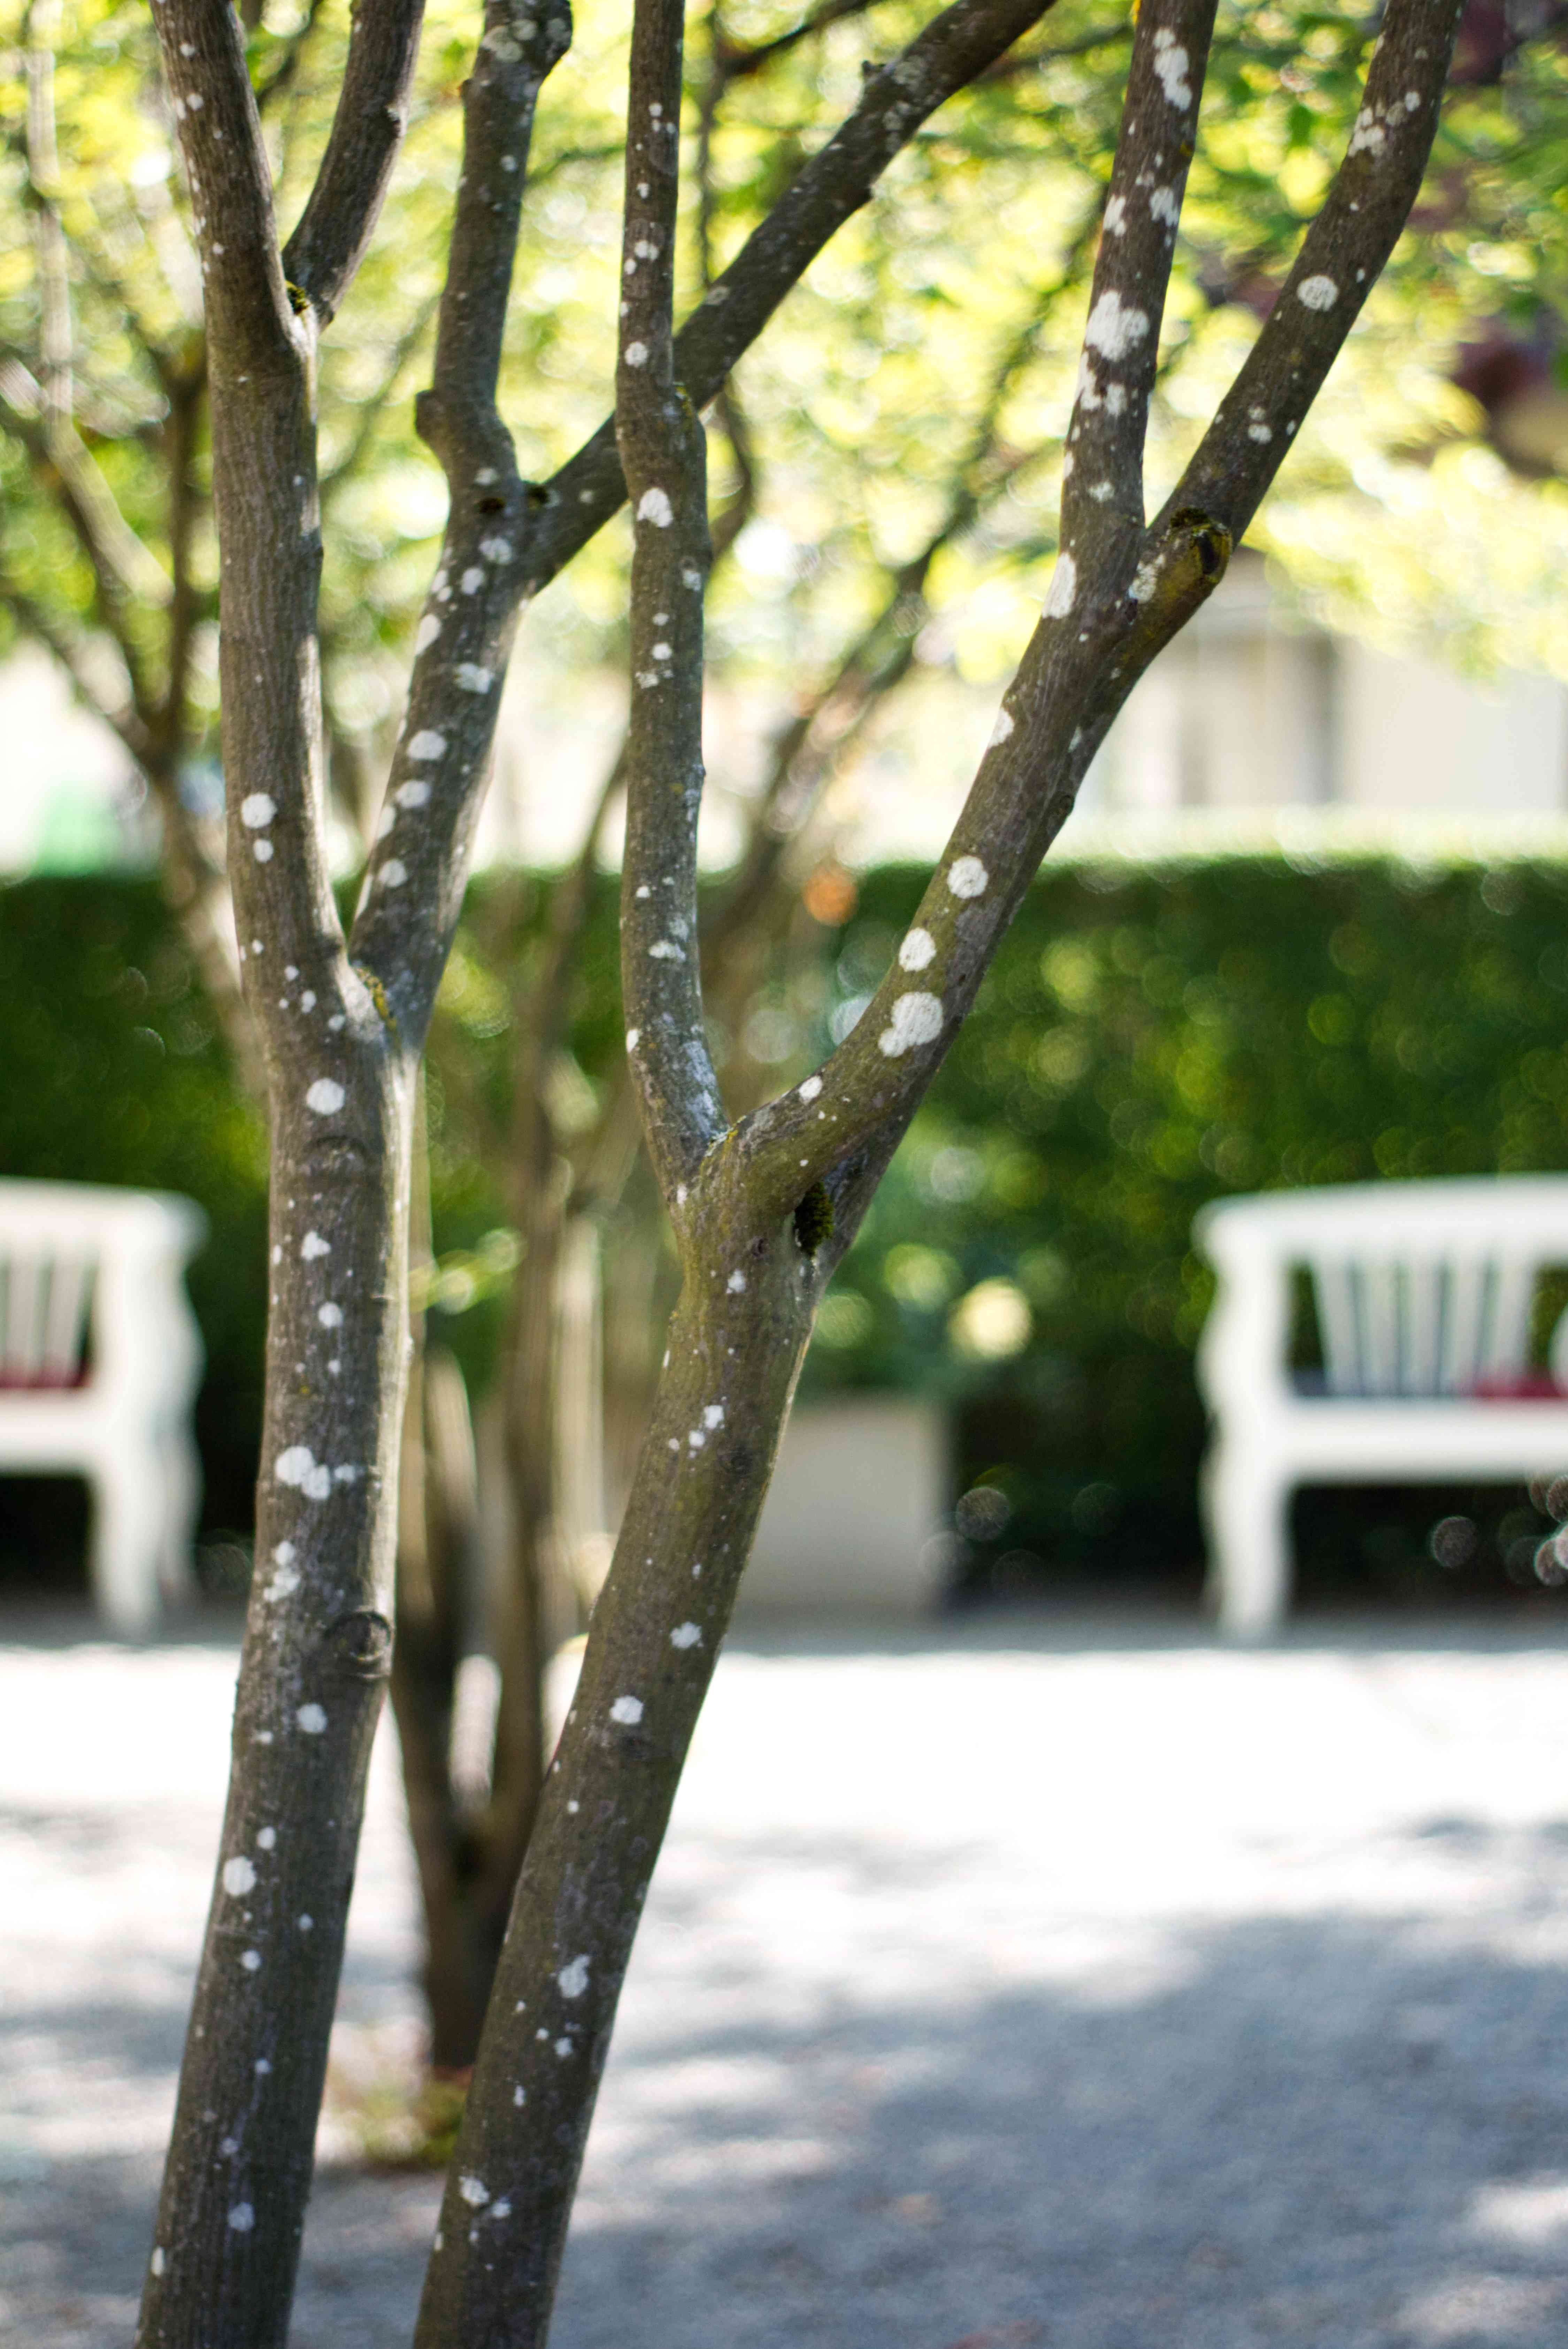 Rock pear garden of the hotel